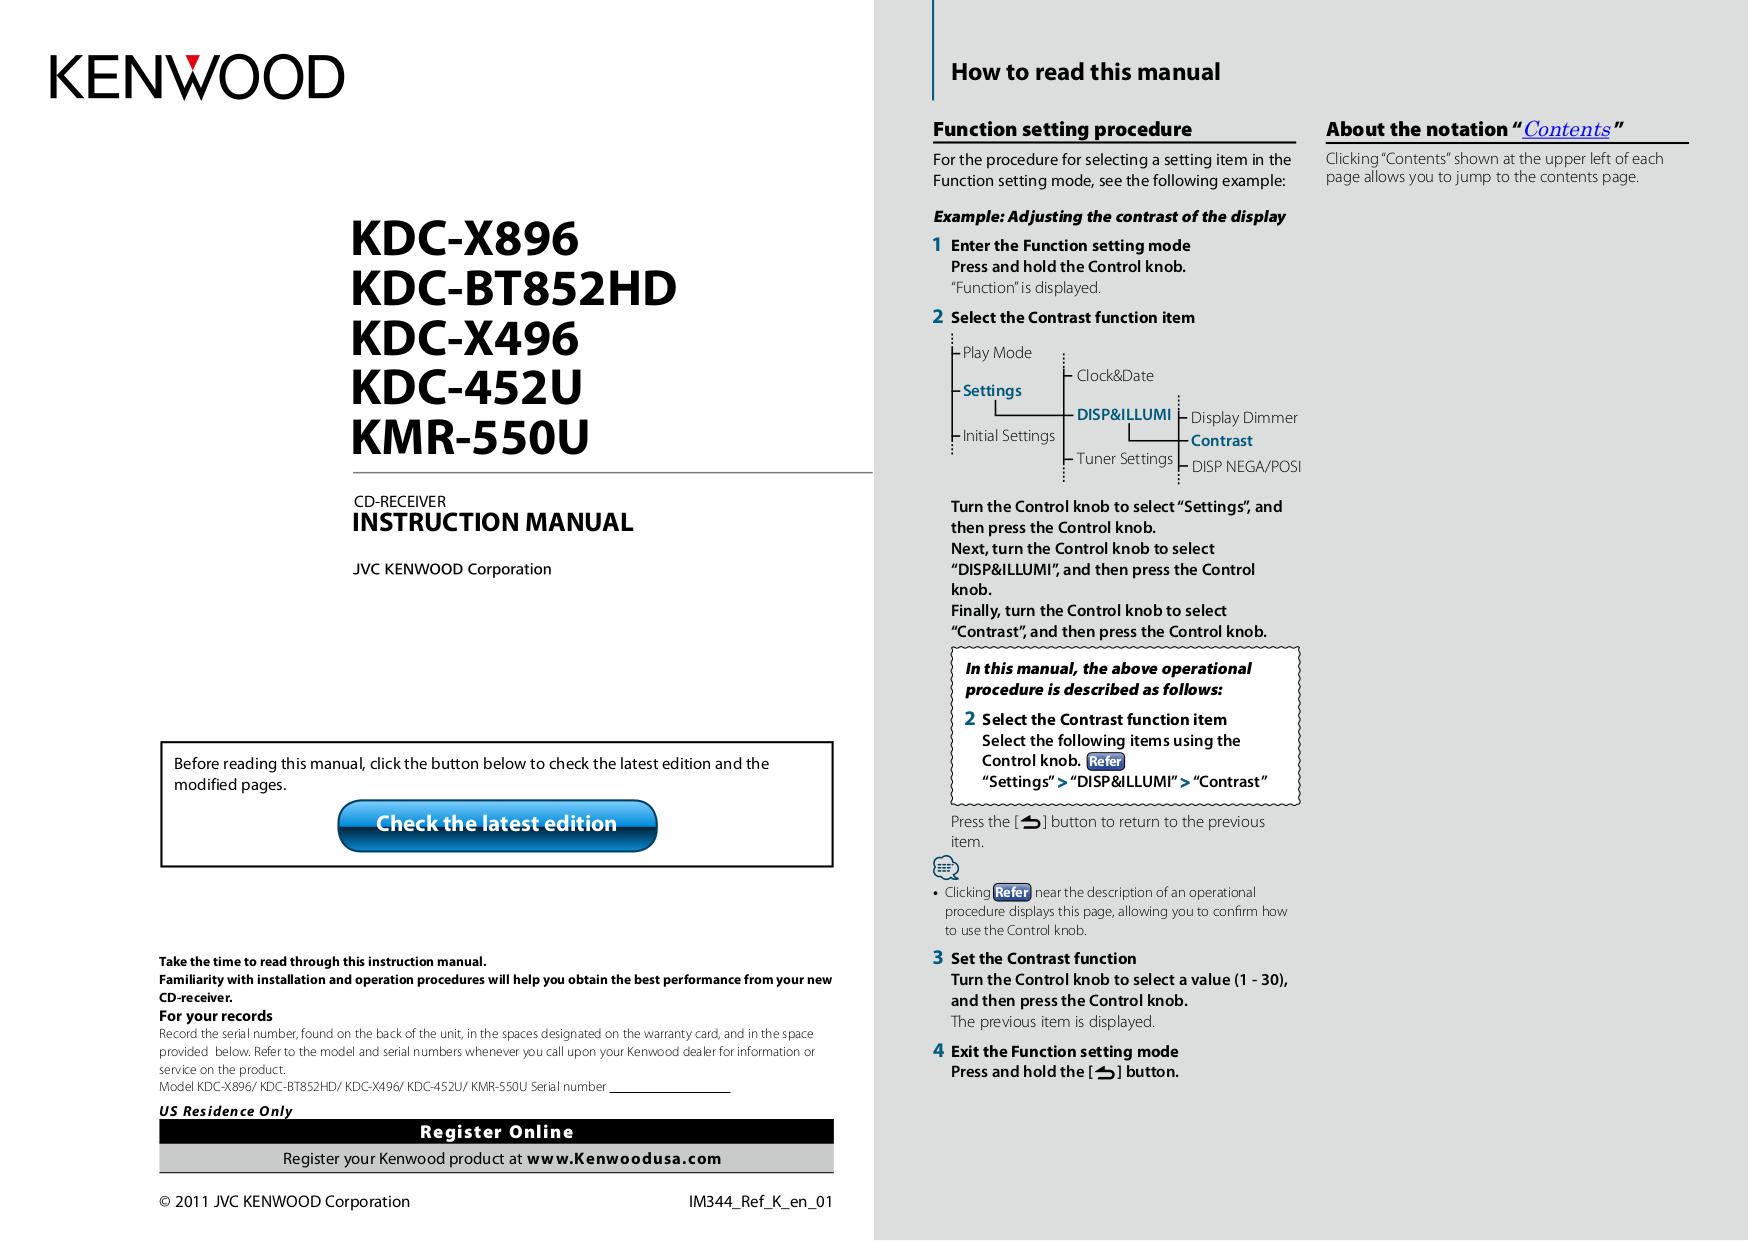 Download free pdf for Kenwood KDC-128 Car Receiver manual on head unit wiring diagram, kenwood harness diagram, kenwood cd receiver wire diagram, kenwood model kdc wiring-diagram, kenwood kdc x396 wiring-diagram, kenwood cd player wiring-diagram, kenwood kdc 255u wiring-diagram, kenwood kdc 210u wiring diagrams, kenwood ddx6019 wiring-diagram, kenwood kdc-152 wiring-diagram, kenwood kdc 205 wiring-diagram, kenwood sub amp wiring harness colors, kenwood kdc 128 wiring harness, kenwood kdc 138 pinout, kenwood kdc 132 wiring-diagram, kenwood kdc mp205 wiring, jbl marine stereo wiring diagram, kenwood model kdc install wiring, kenwood kdc mp142 wiring-diagram, mach audio wiring diagram,